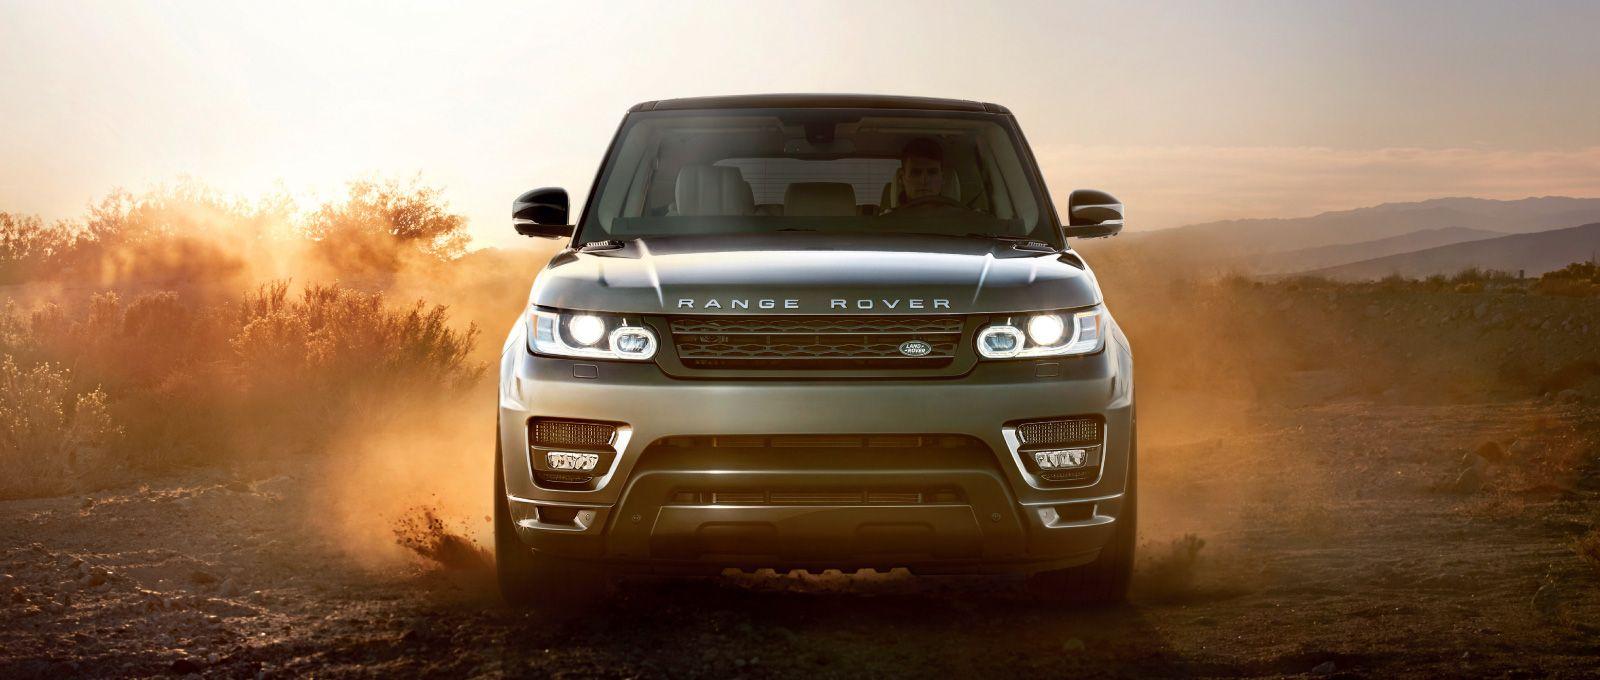 2014 Range Rover Sport Naperville Il Land Rover Hoffman Estates Range Rover Sport 2017 Range Rover Sport Range Rover